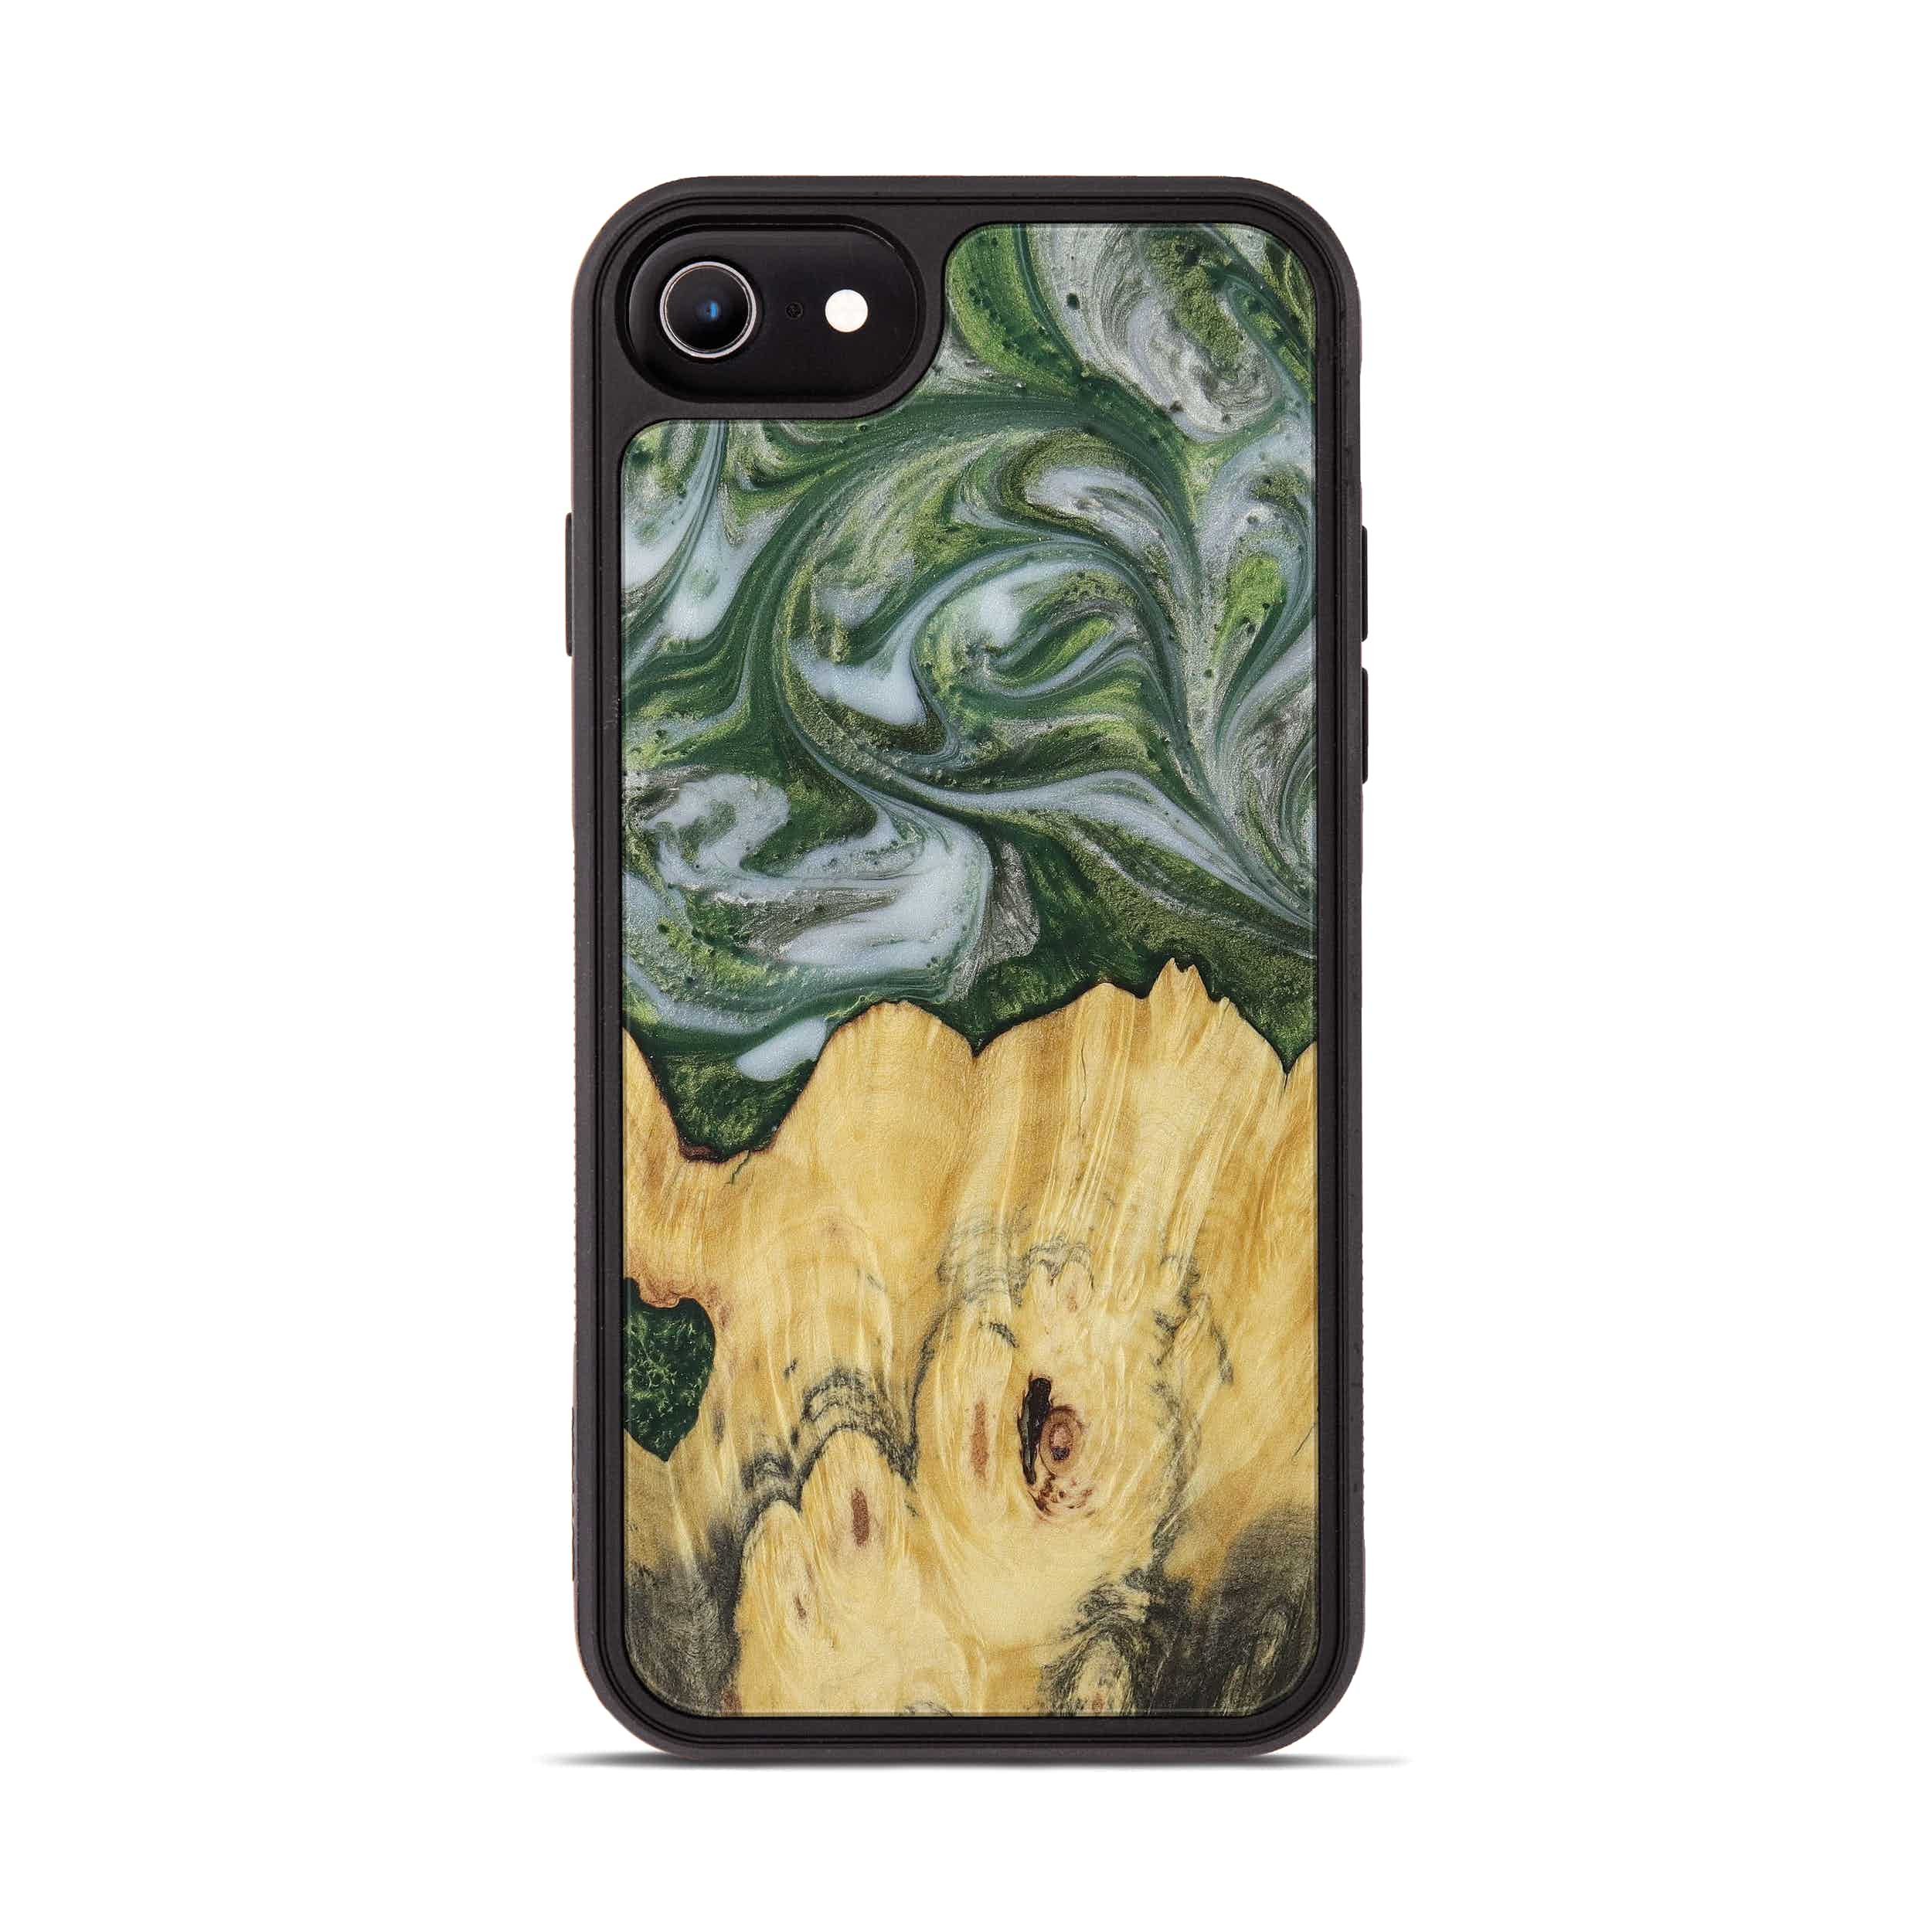 iPhone 6s Wood+Resin Phone Case - Christin (Dark Green, 396002)